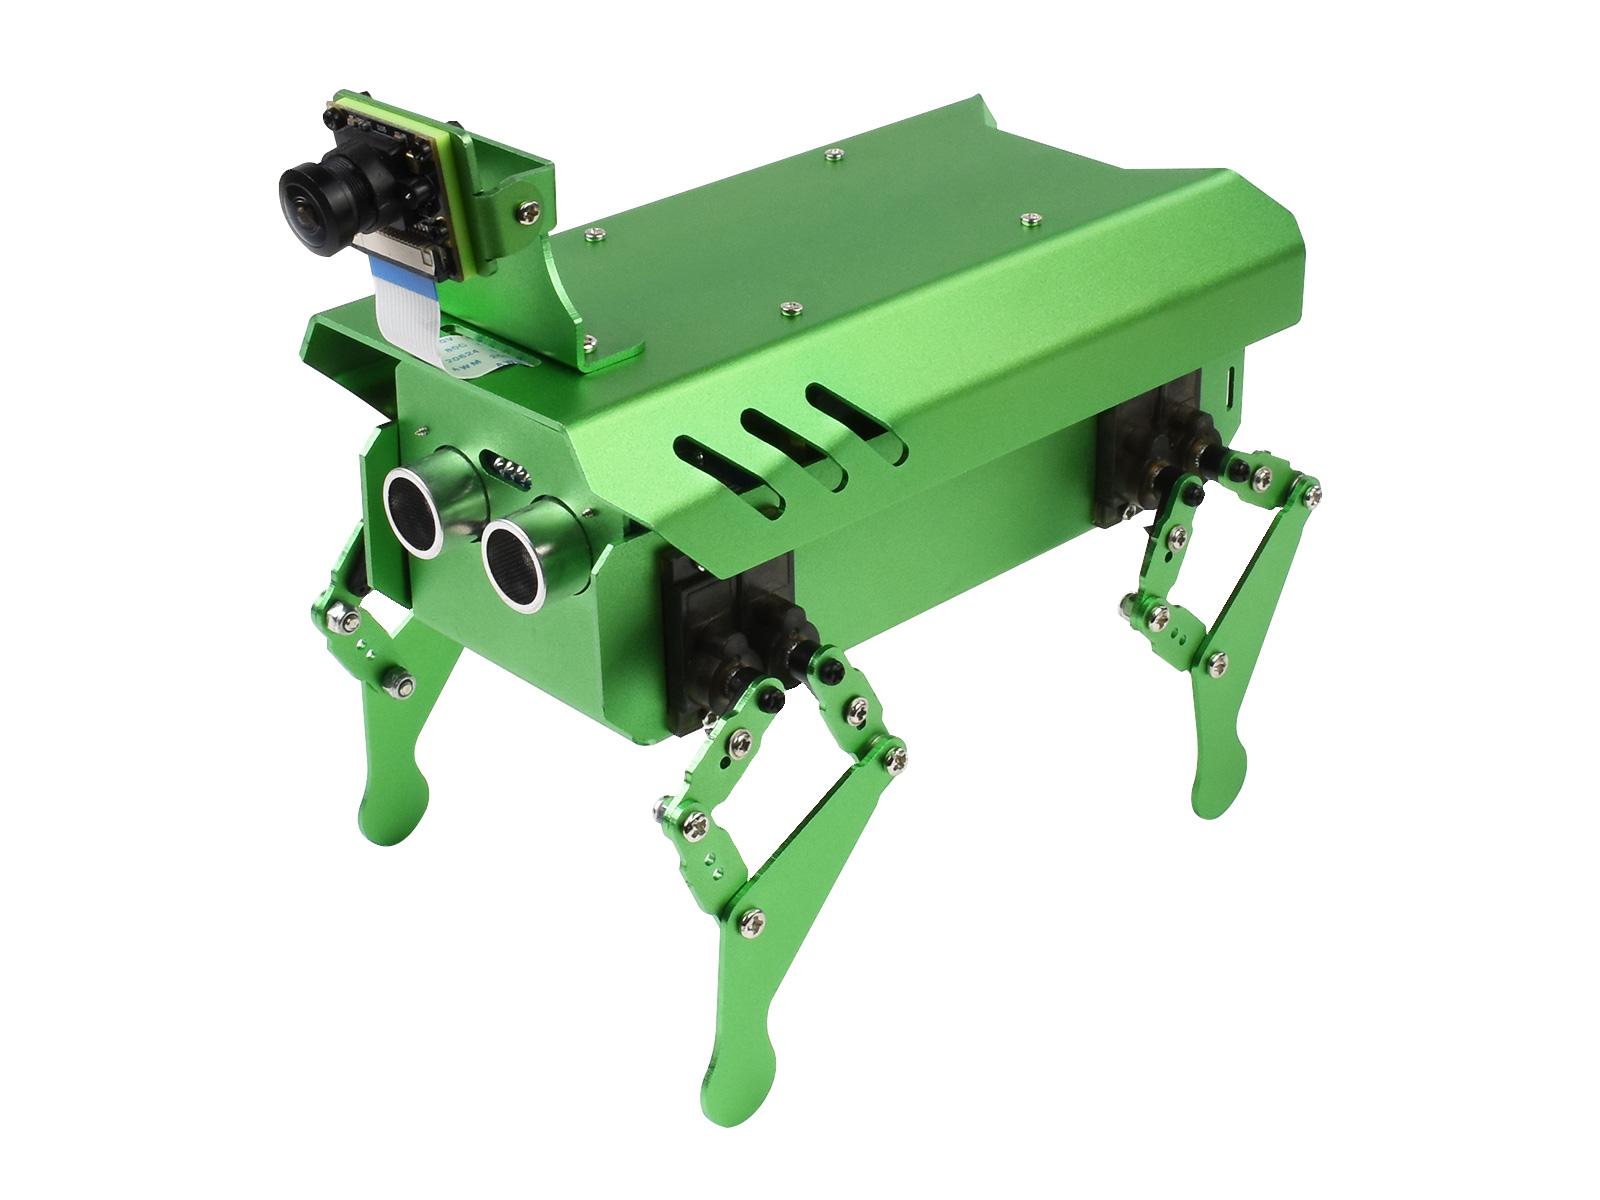 PIPPY 四足机器人基于树莓派开源仿生机器狗